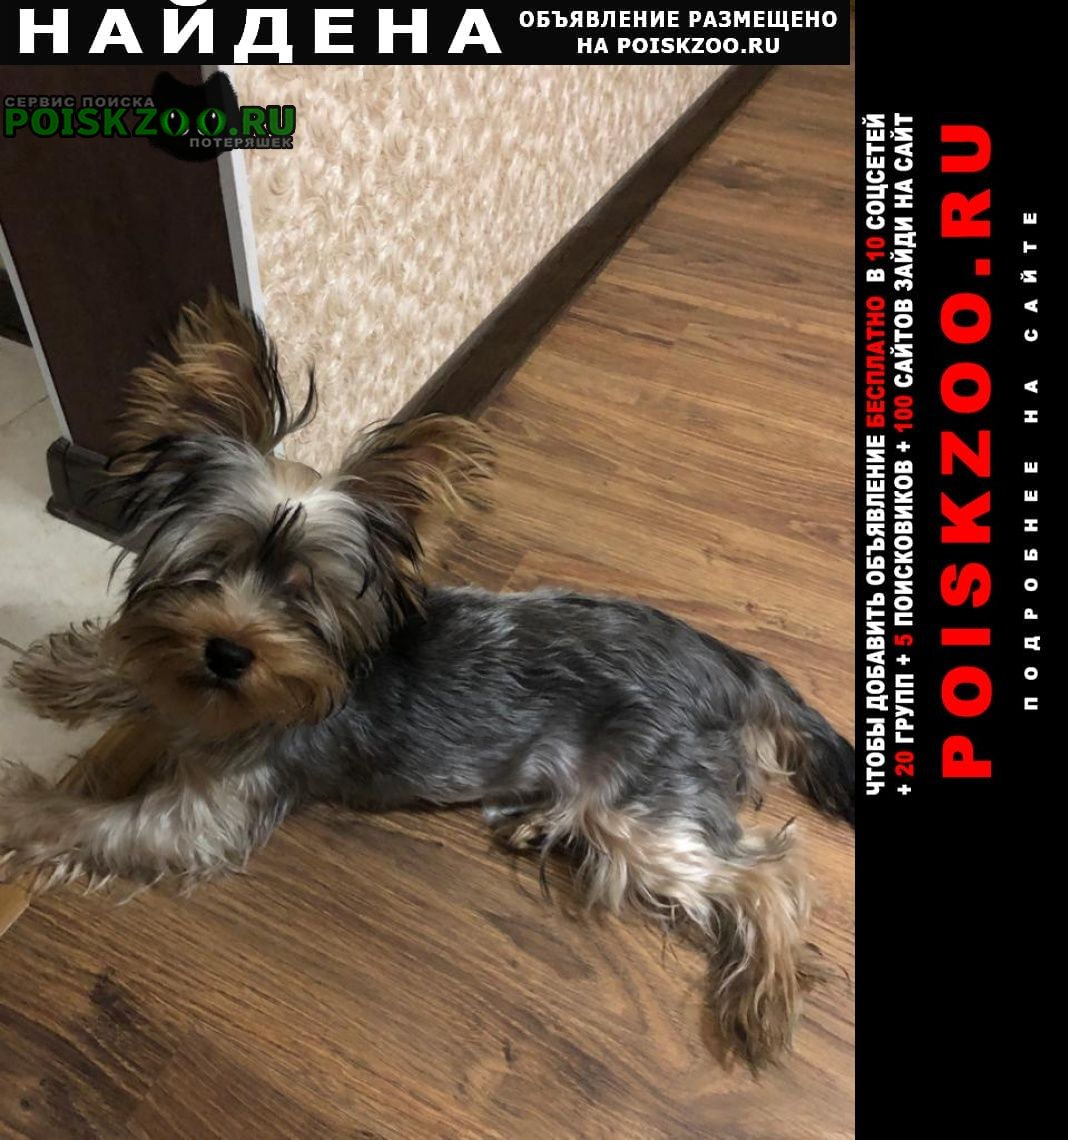 Найдена собака йорк терьер в адлере Сочи